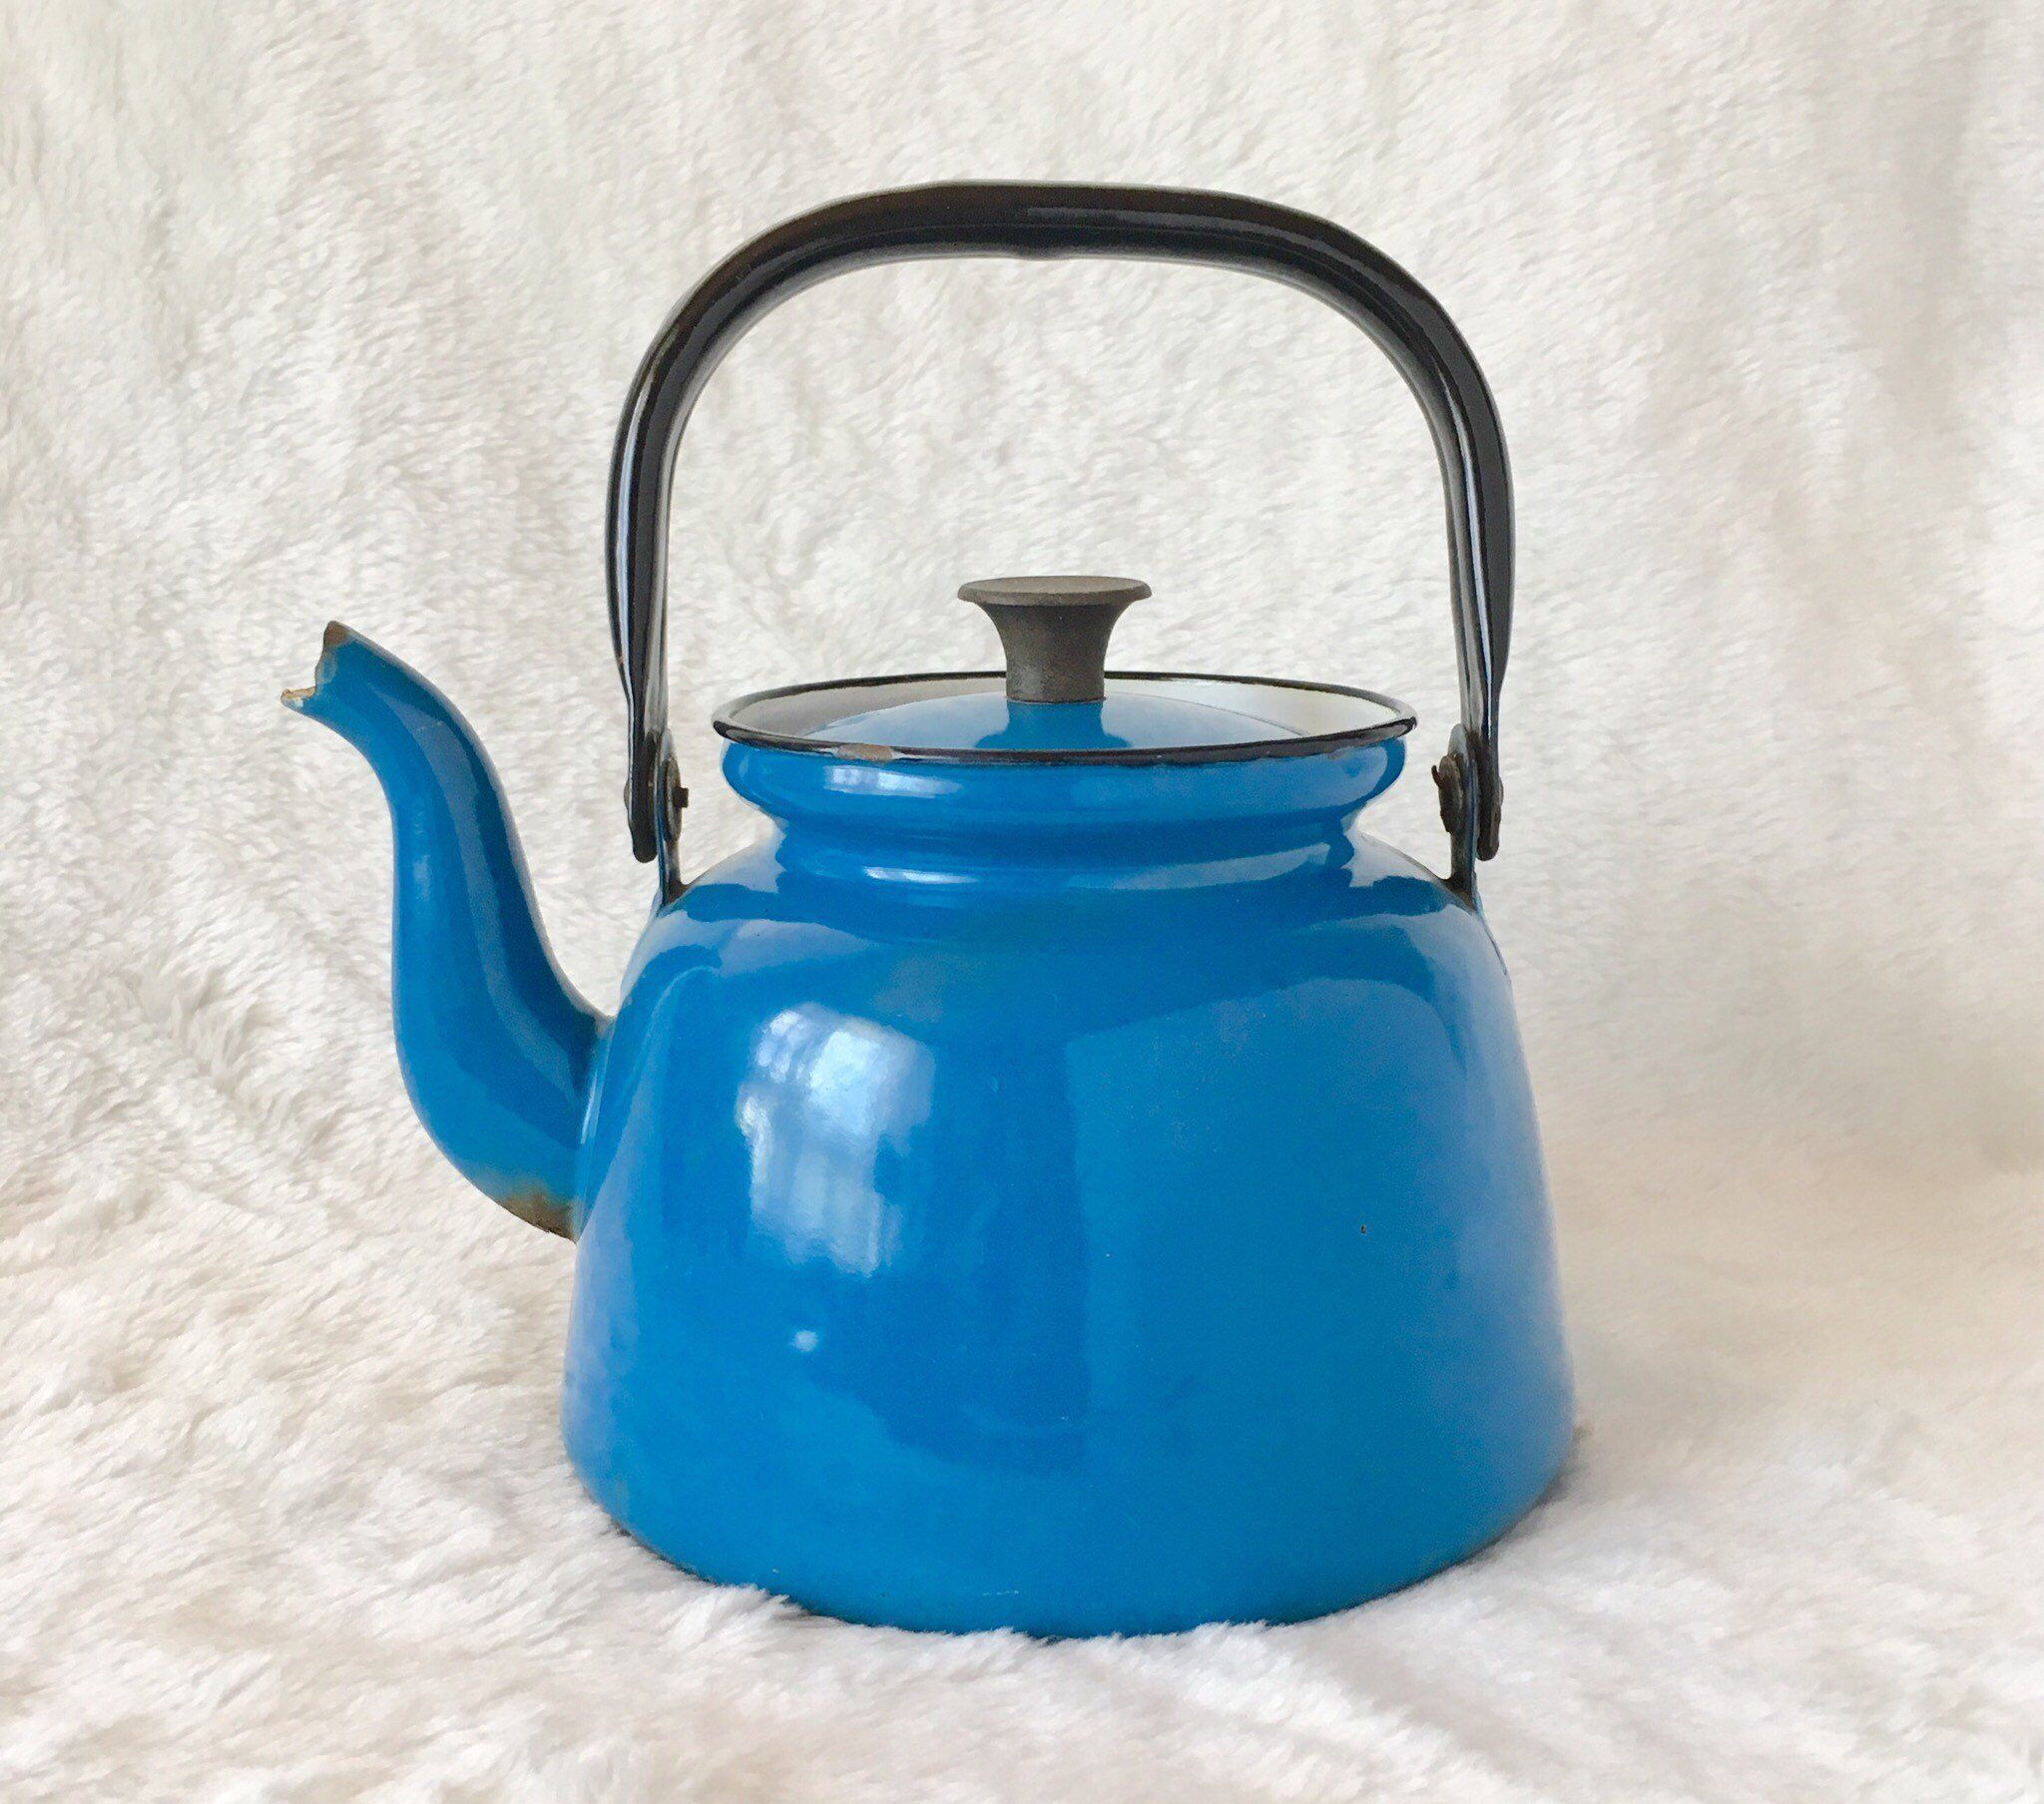 Vintage Blue Enamel Tea Kettle Teapot With Black Metal Handle Plain Rusty Rust Garden Farmhouse Decor Etsy Tea Pots Enamel Teapot Tea Kettle